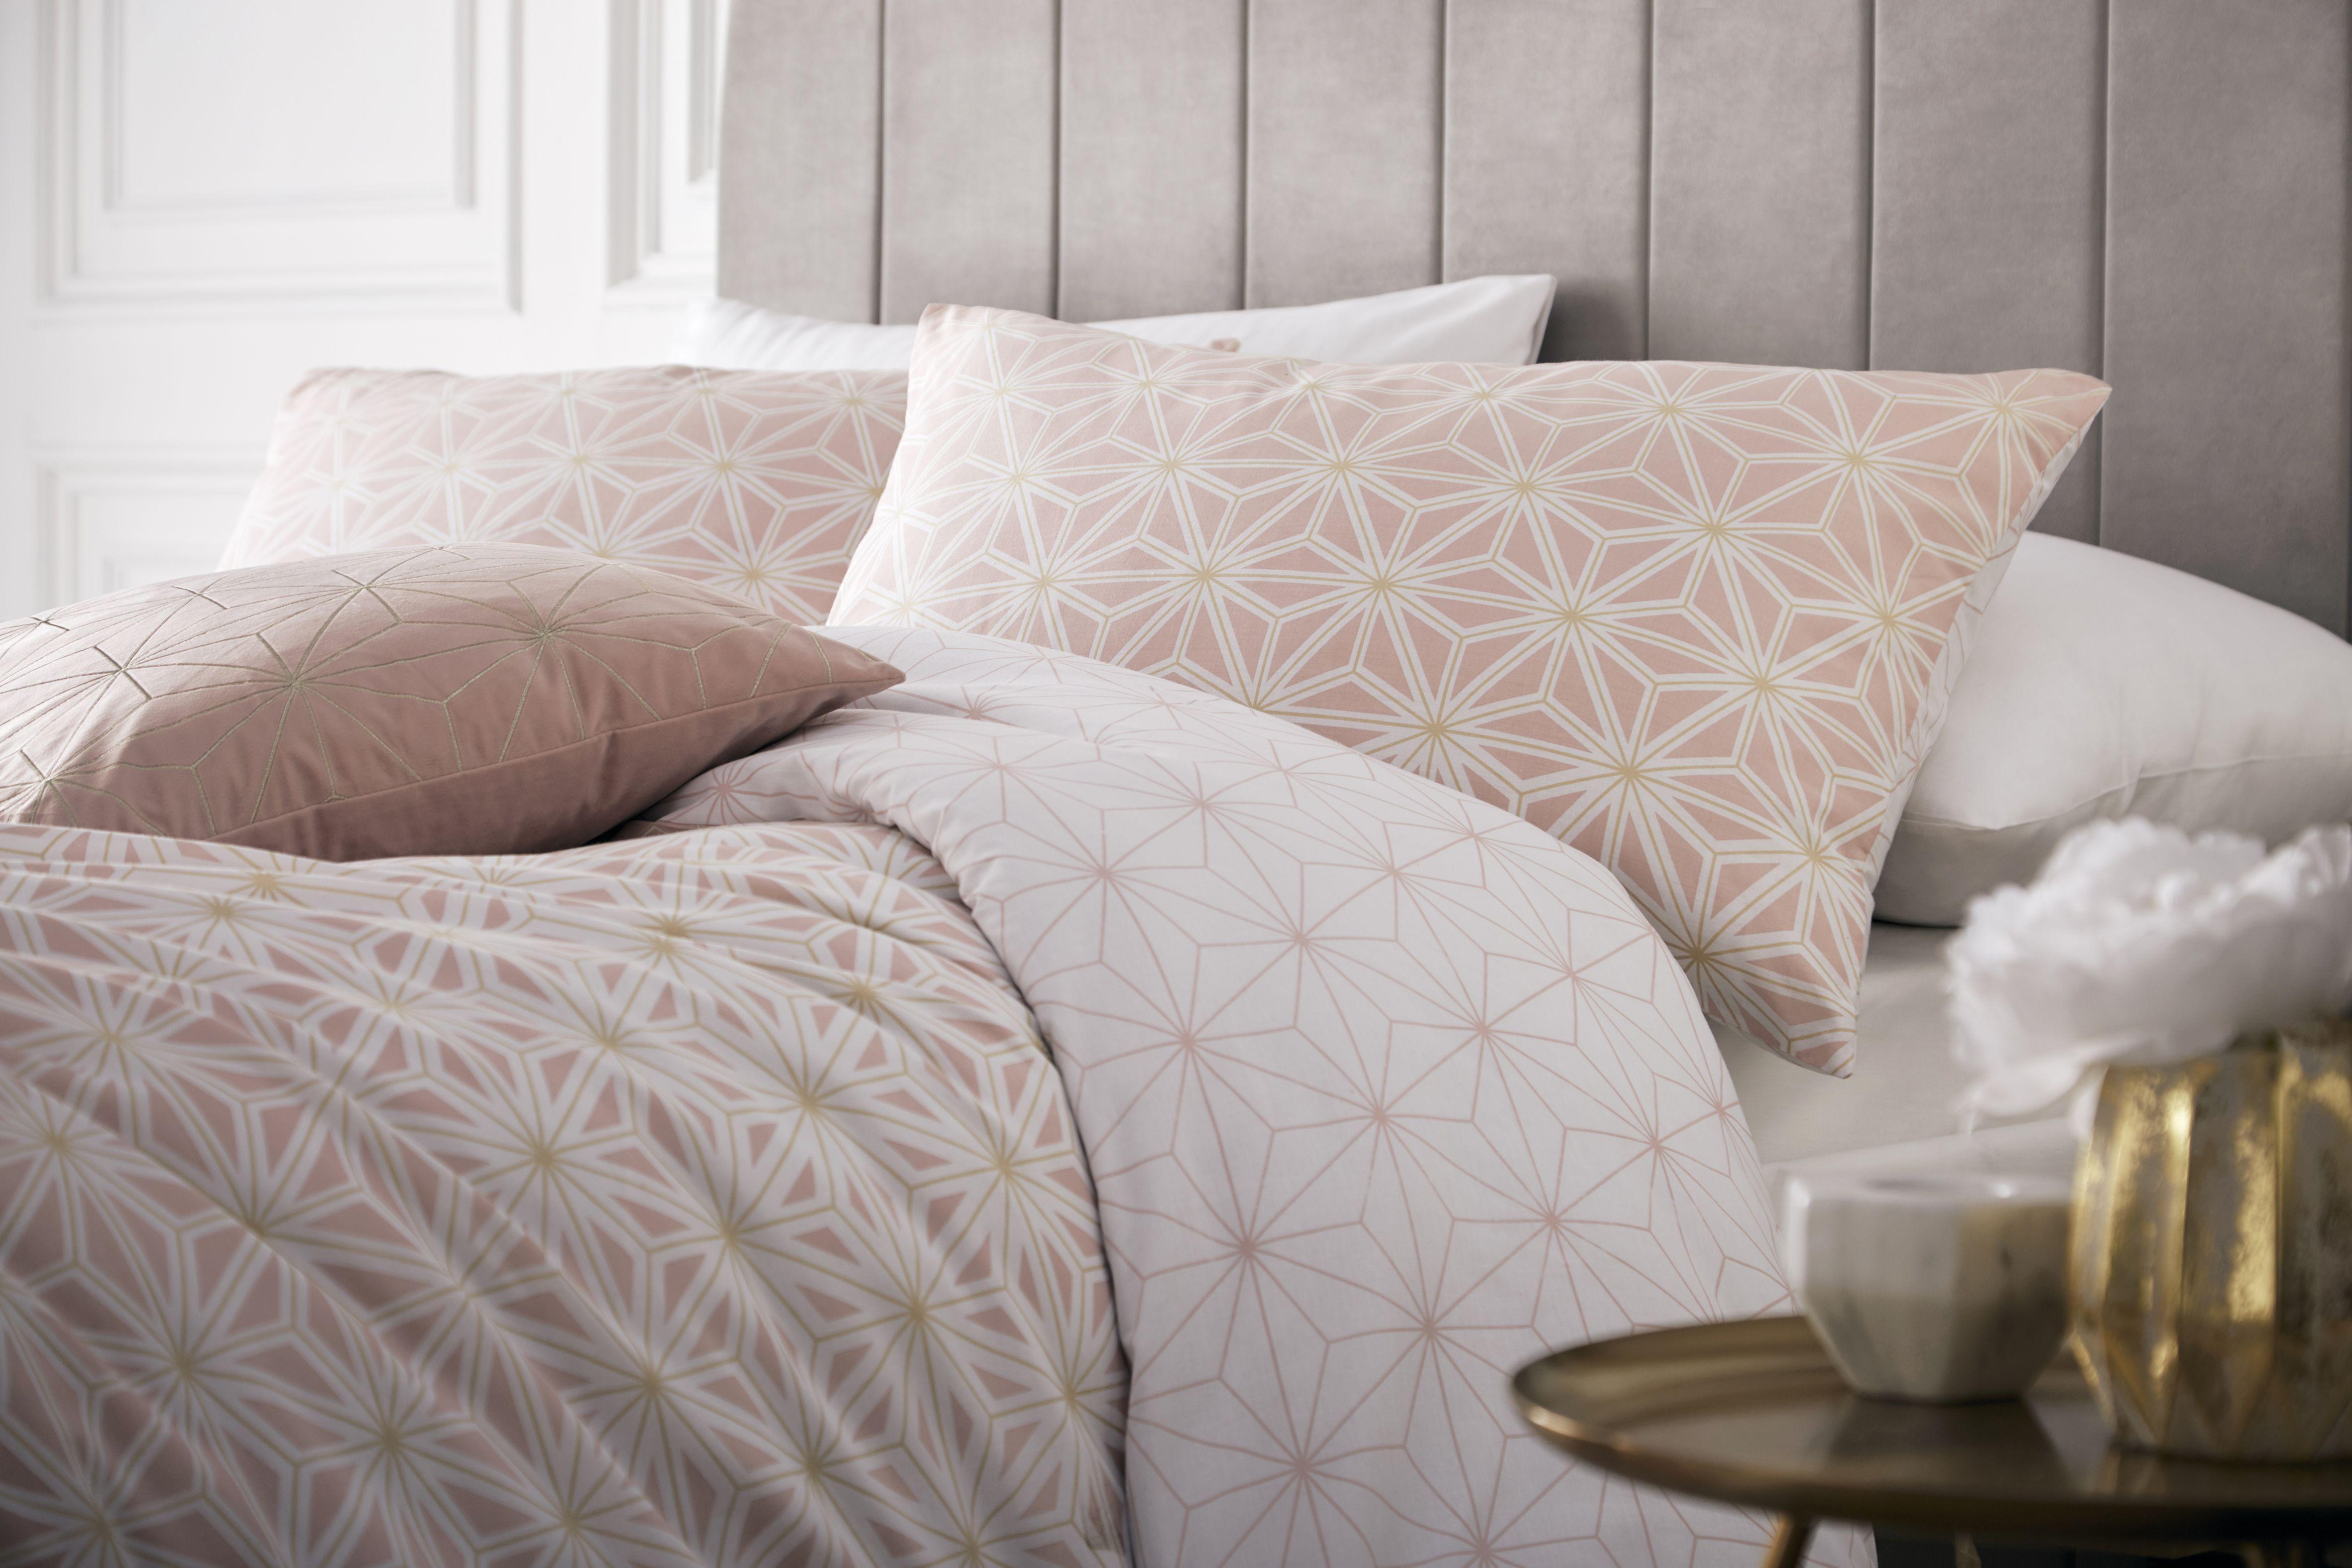 Tessellate Duvet Set Bls/Gld